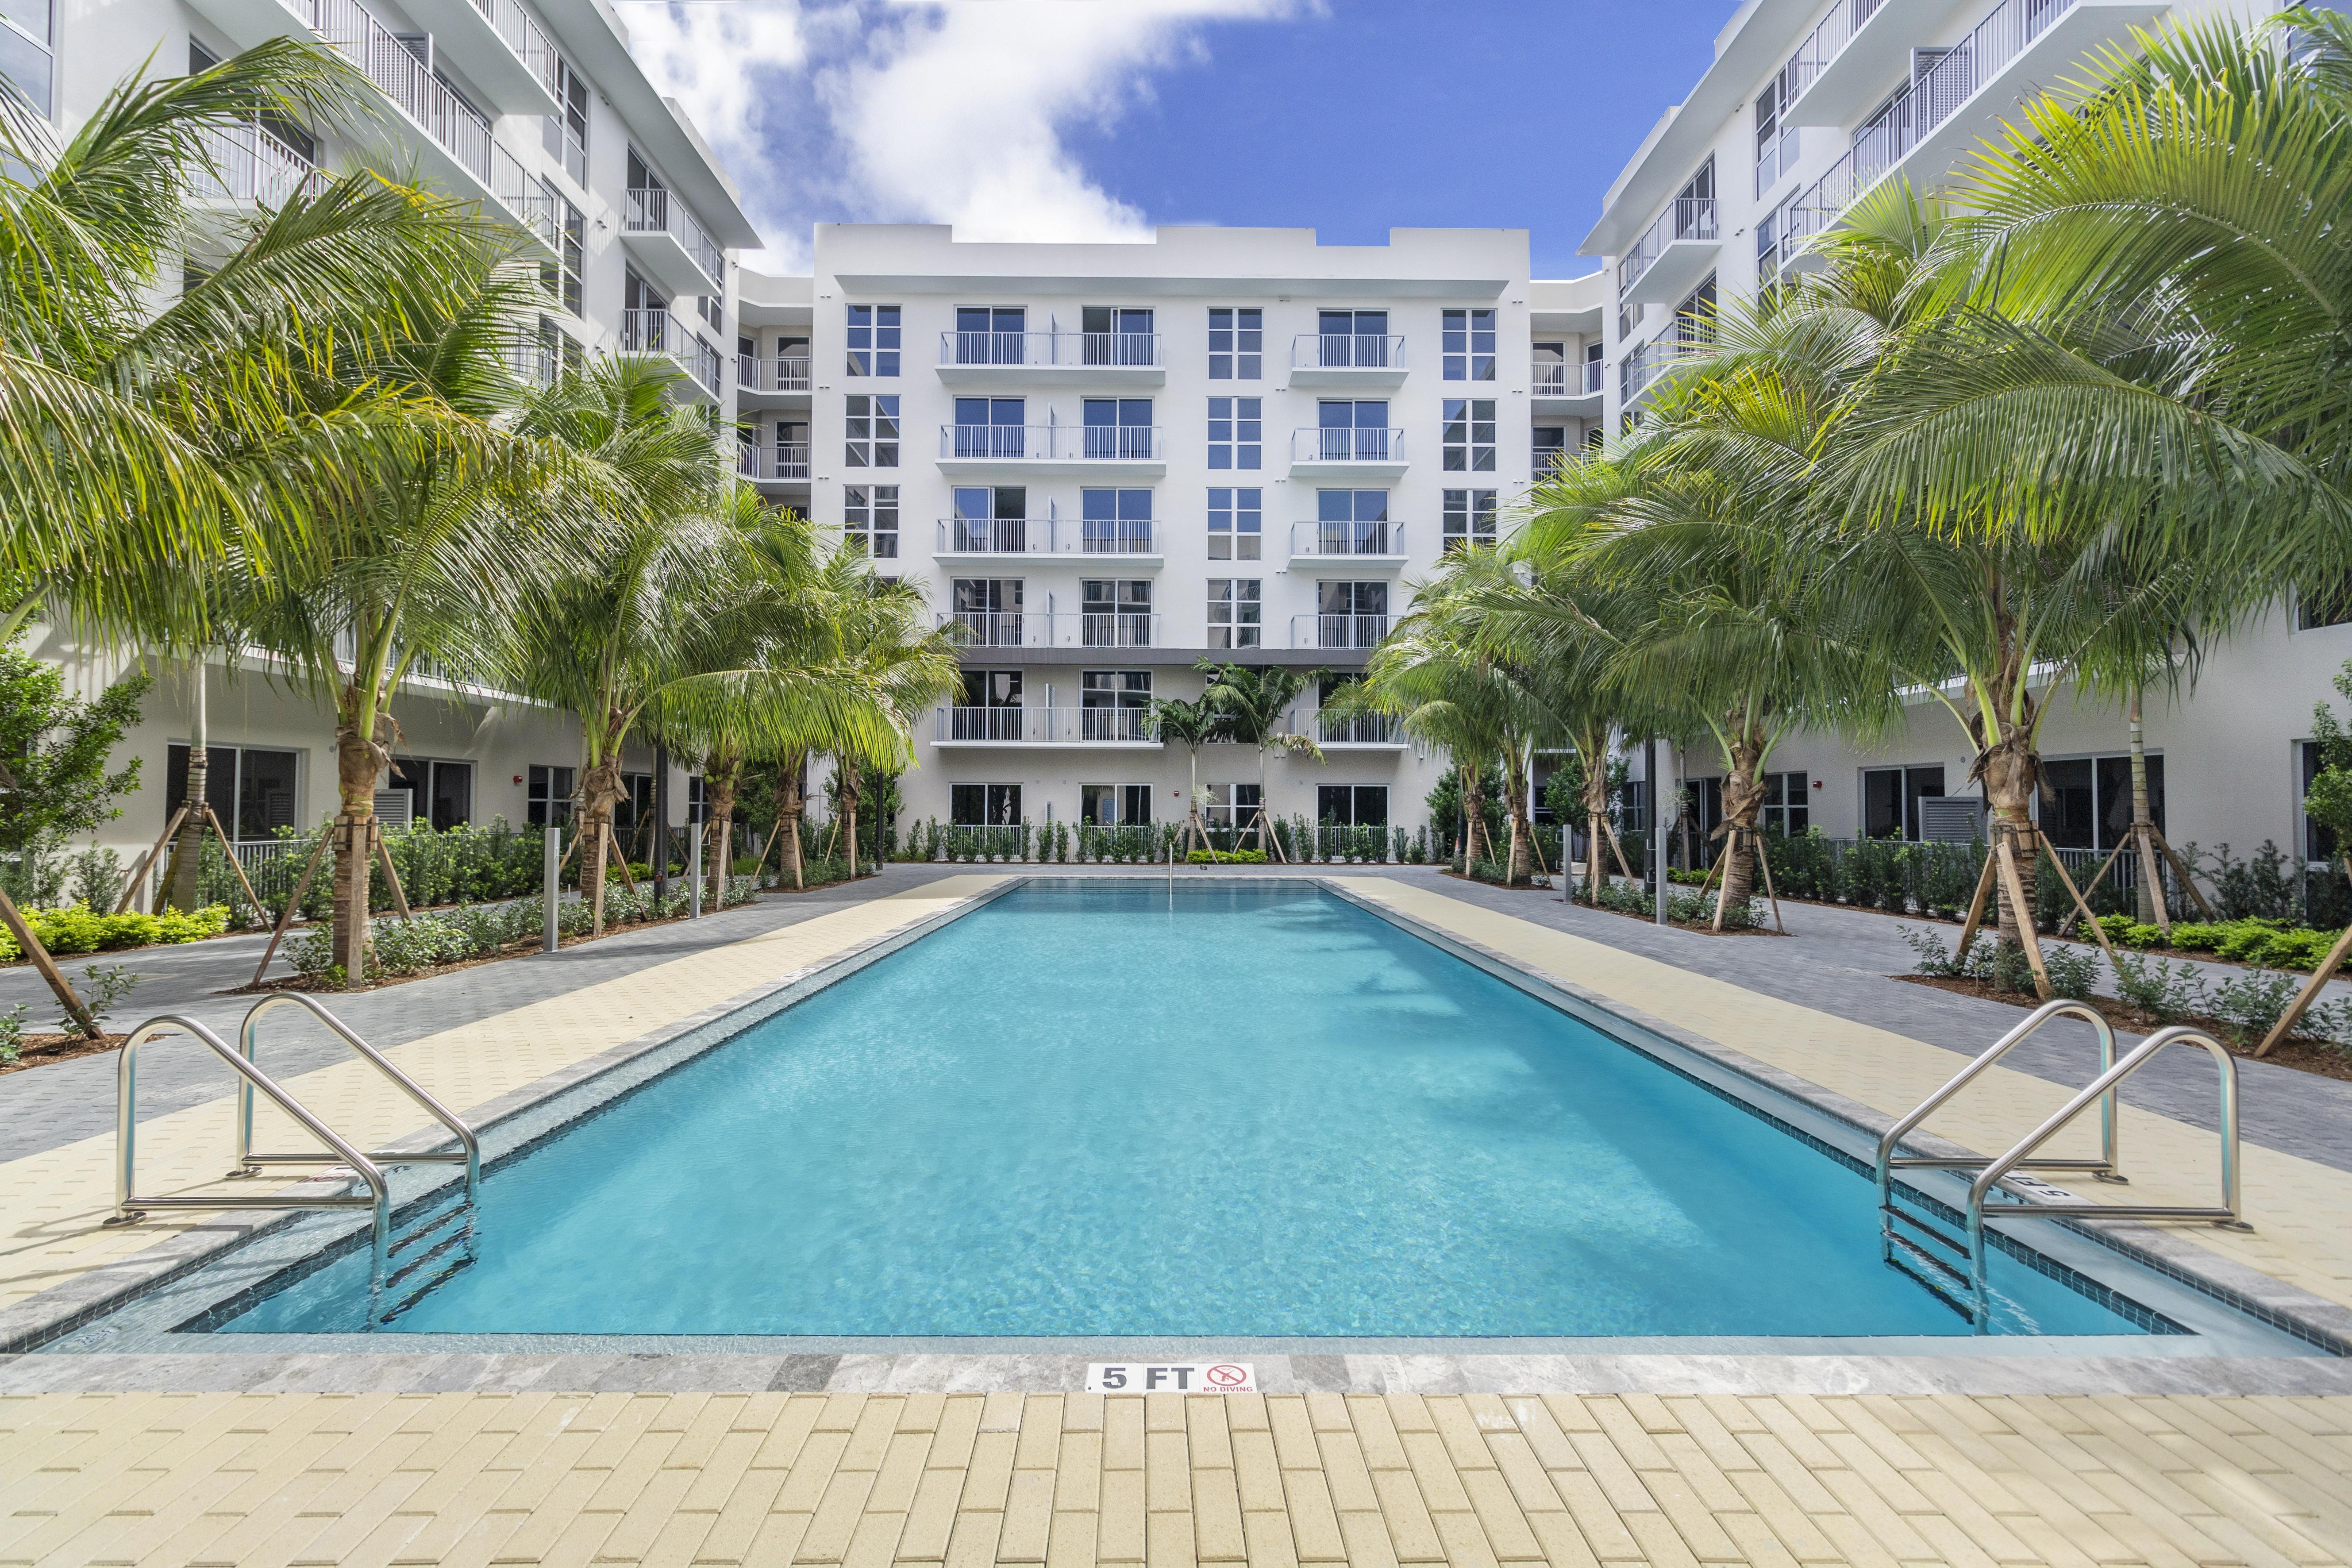 850 Living Miami rental